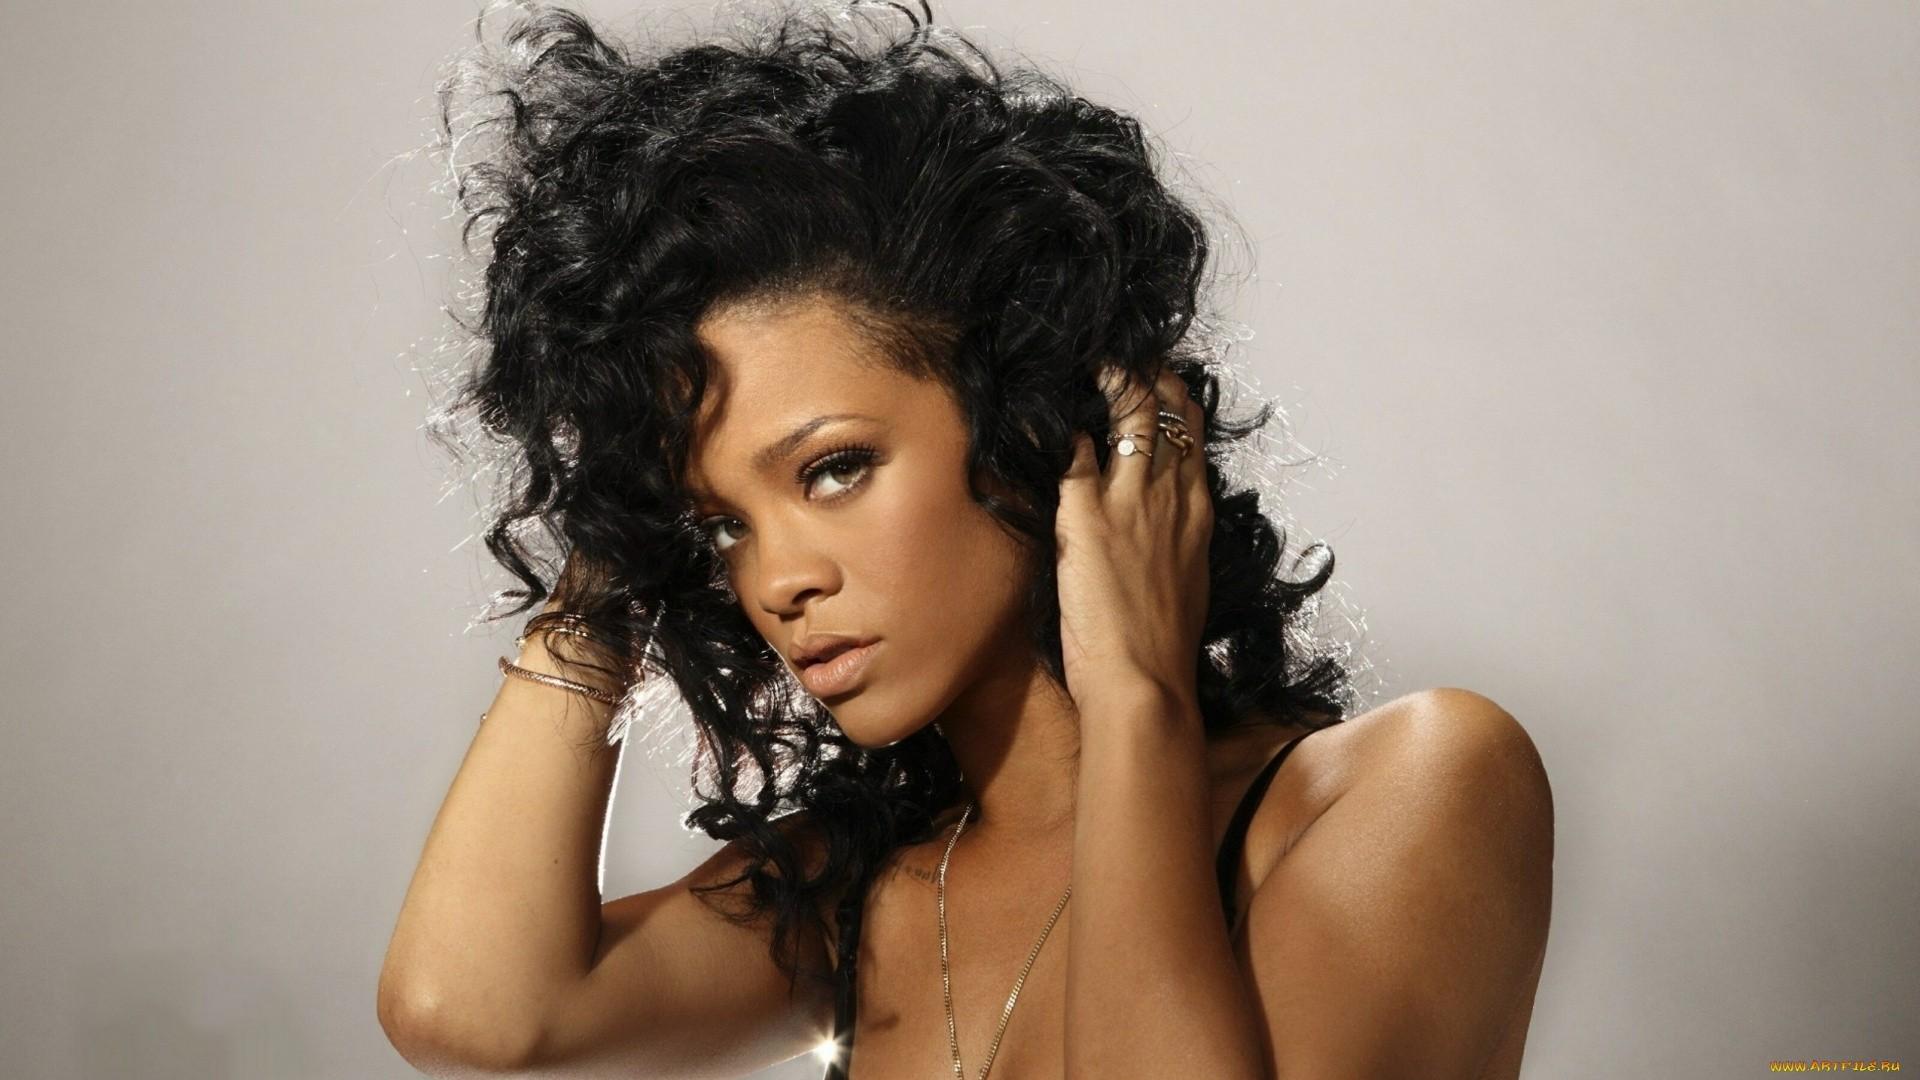 Rihanna a wallpaper